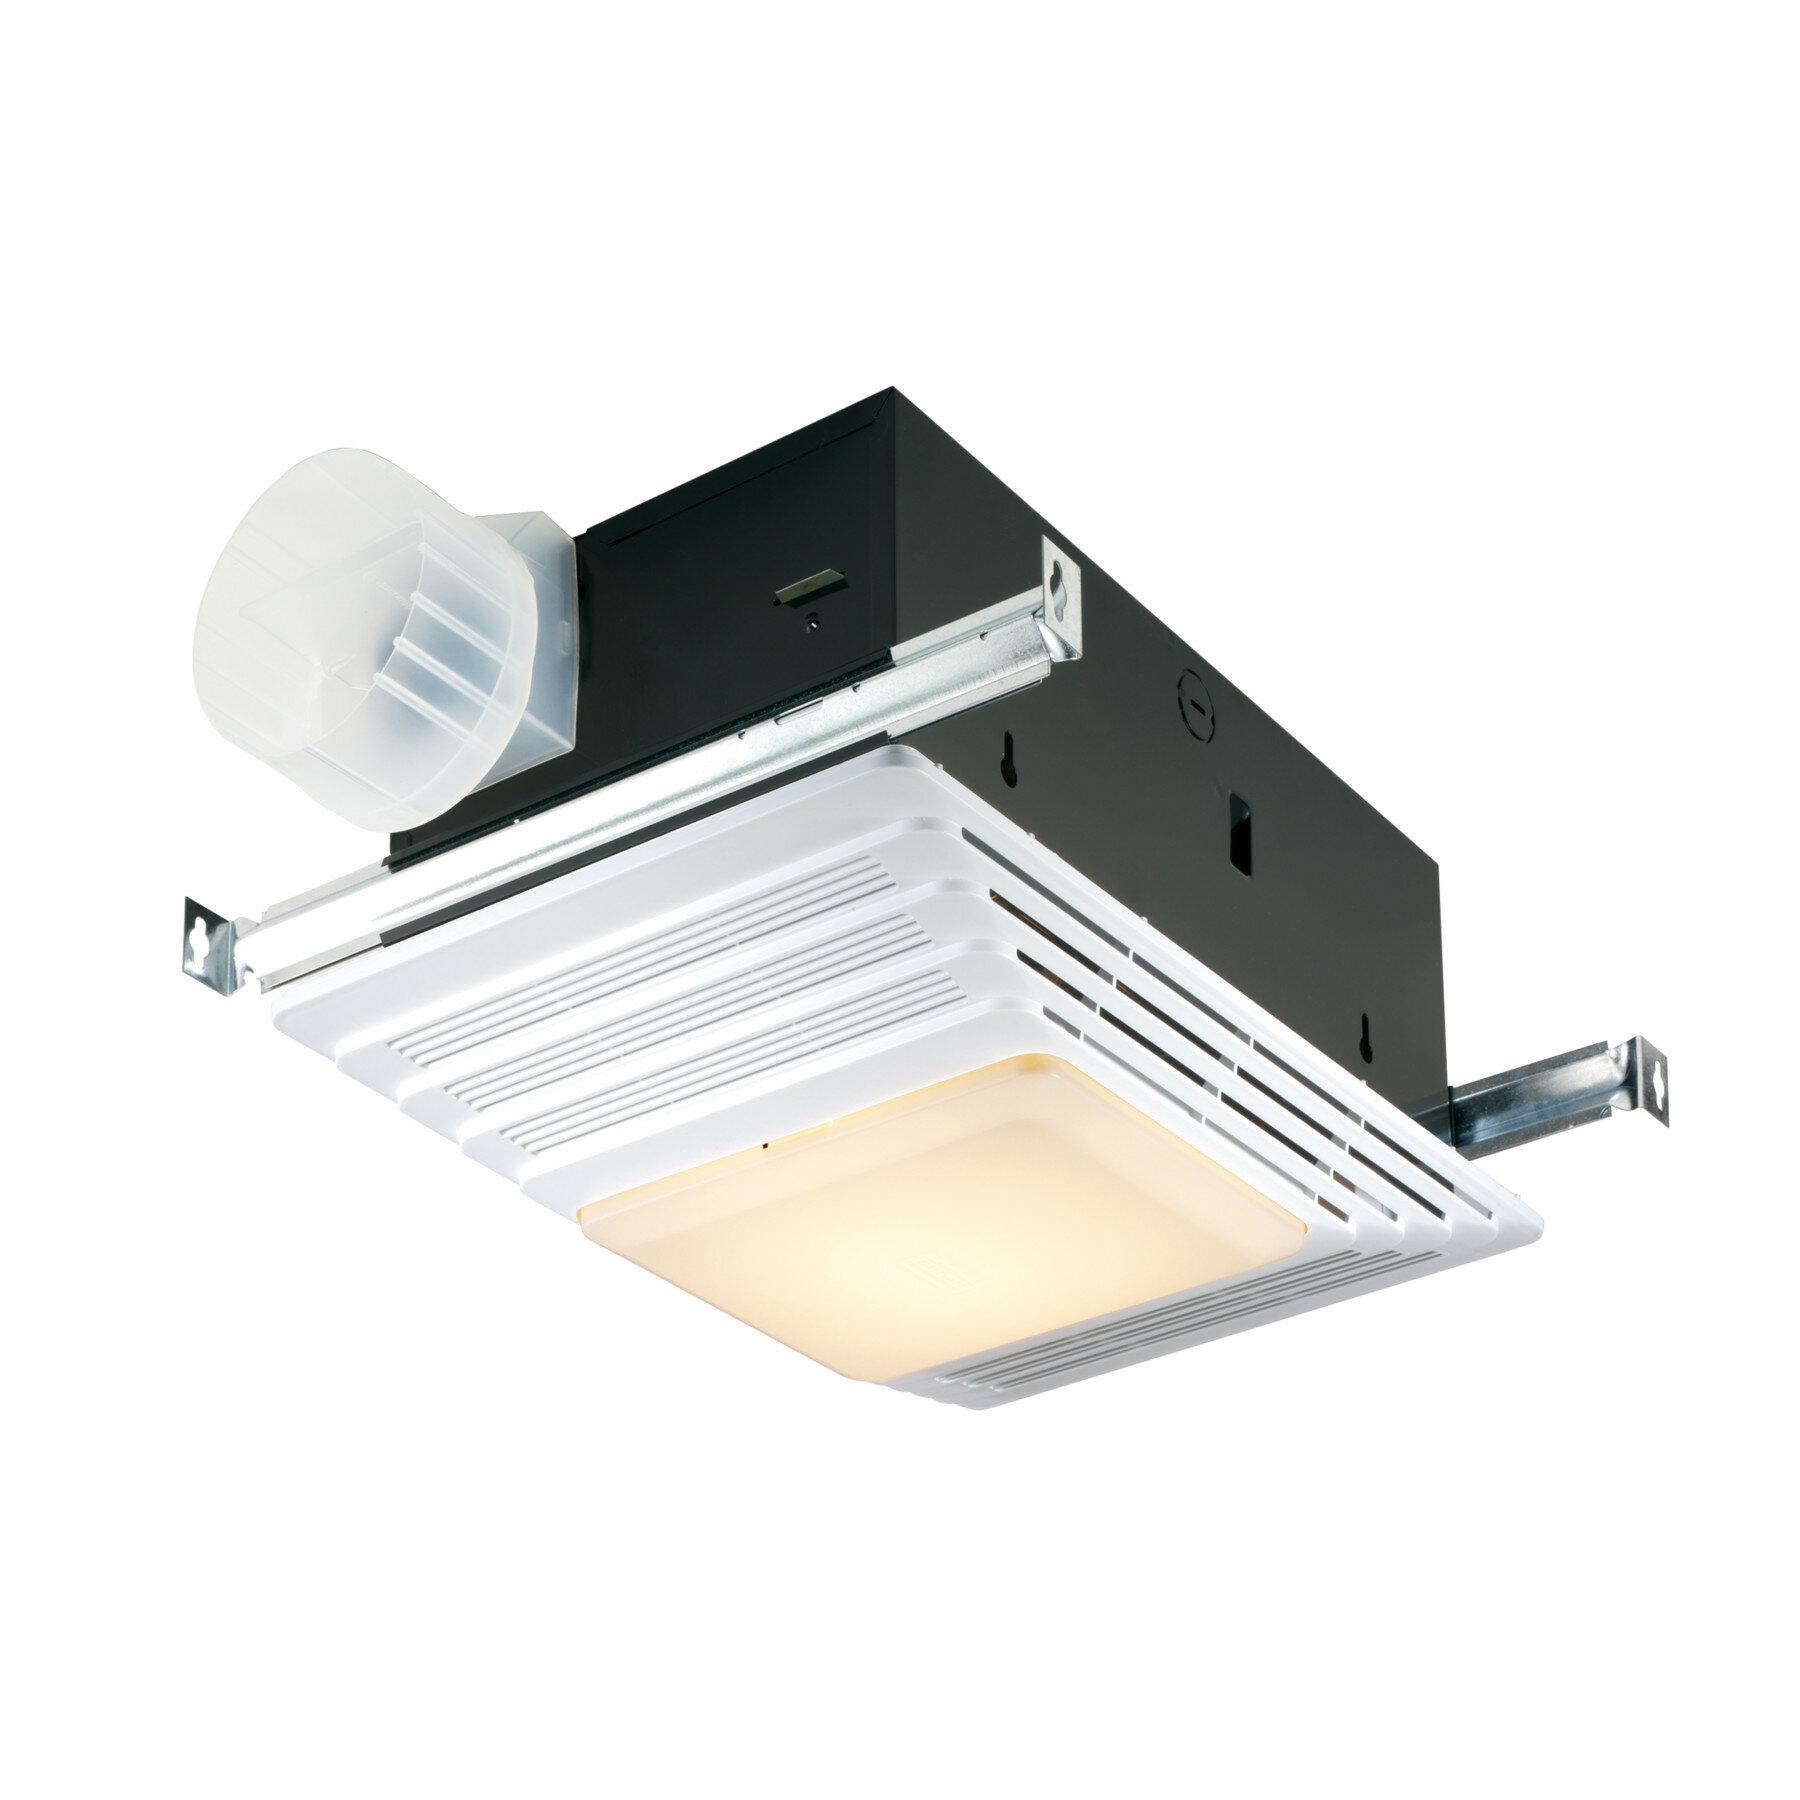 Broan 50 Cfm Bathroom Fan With Light And Heater Reviews Wayfair